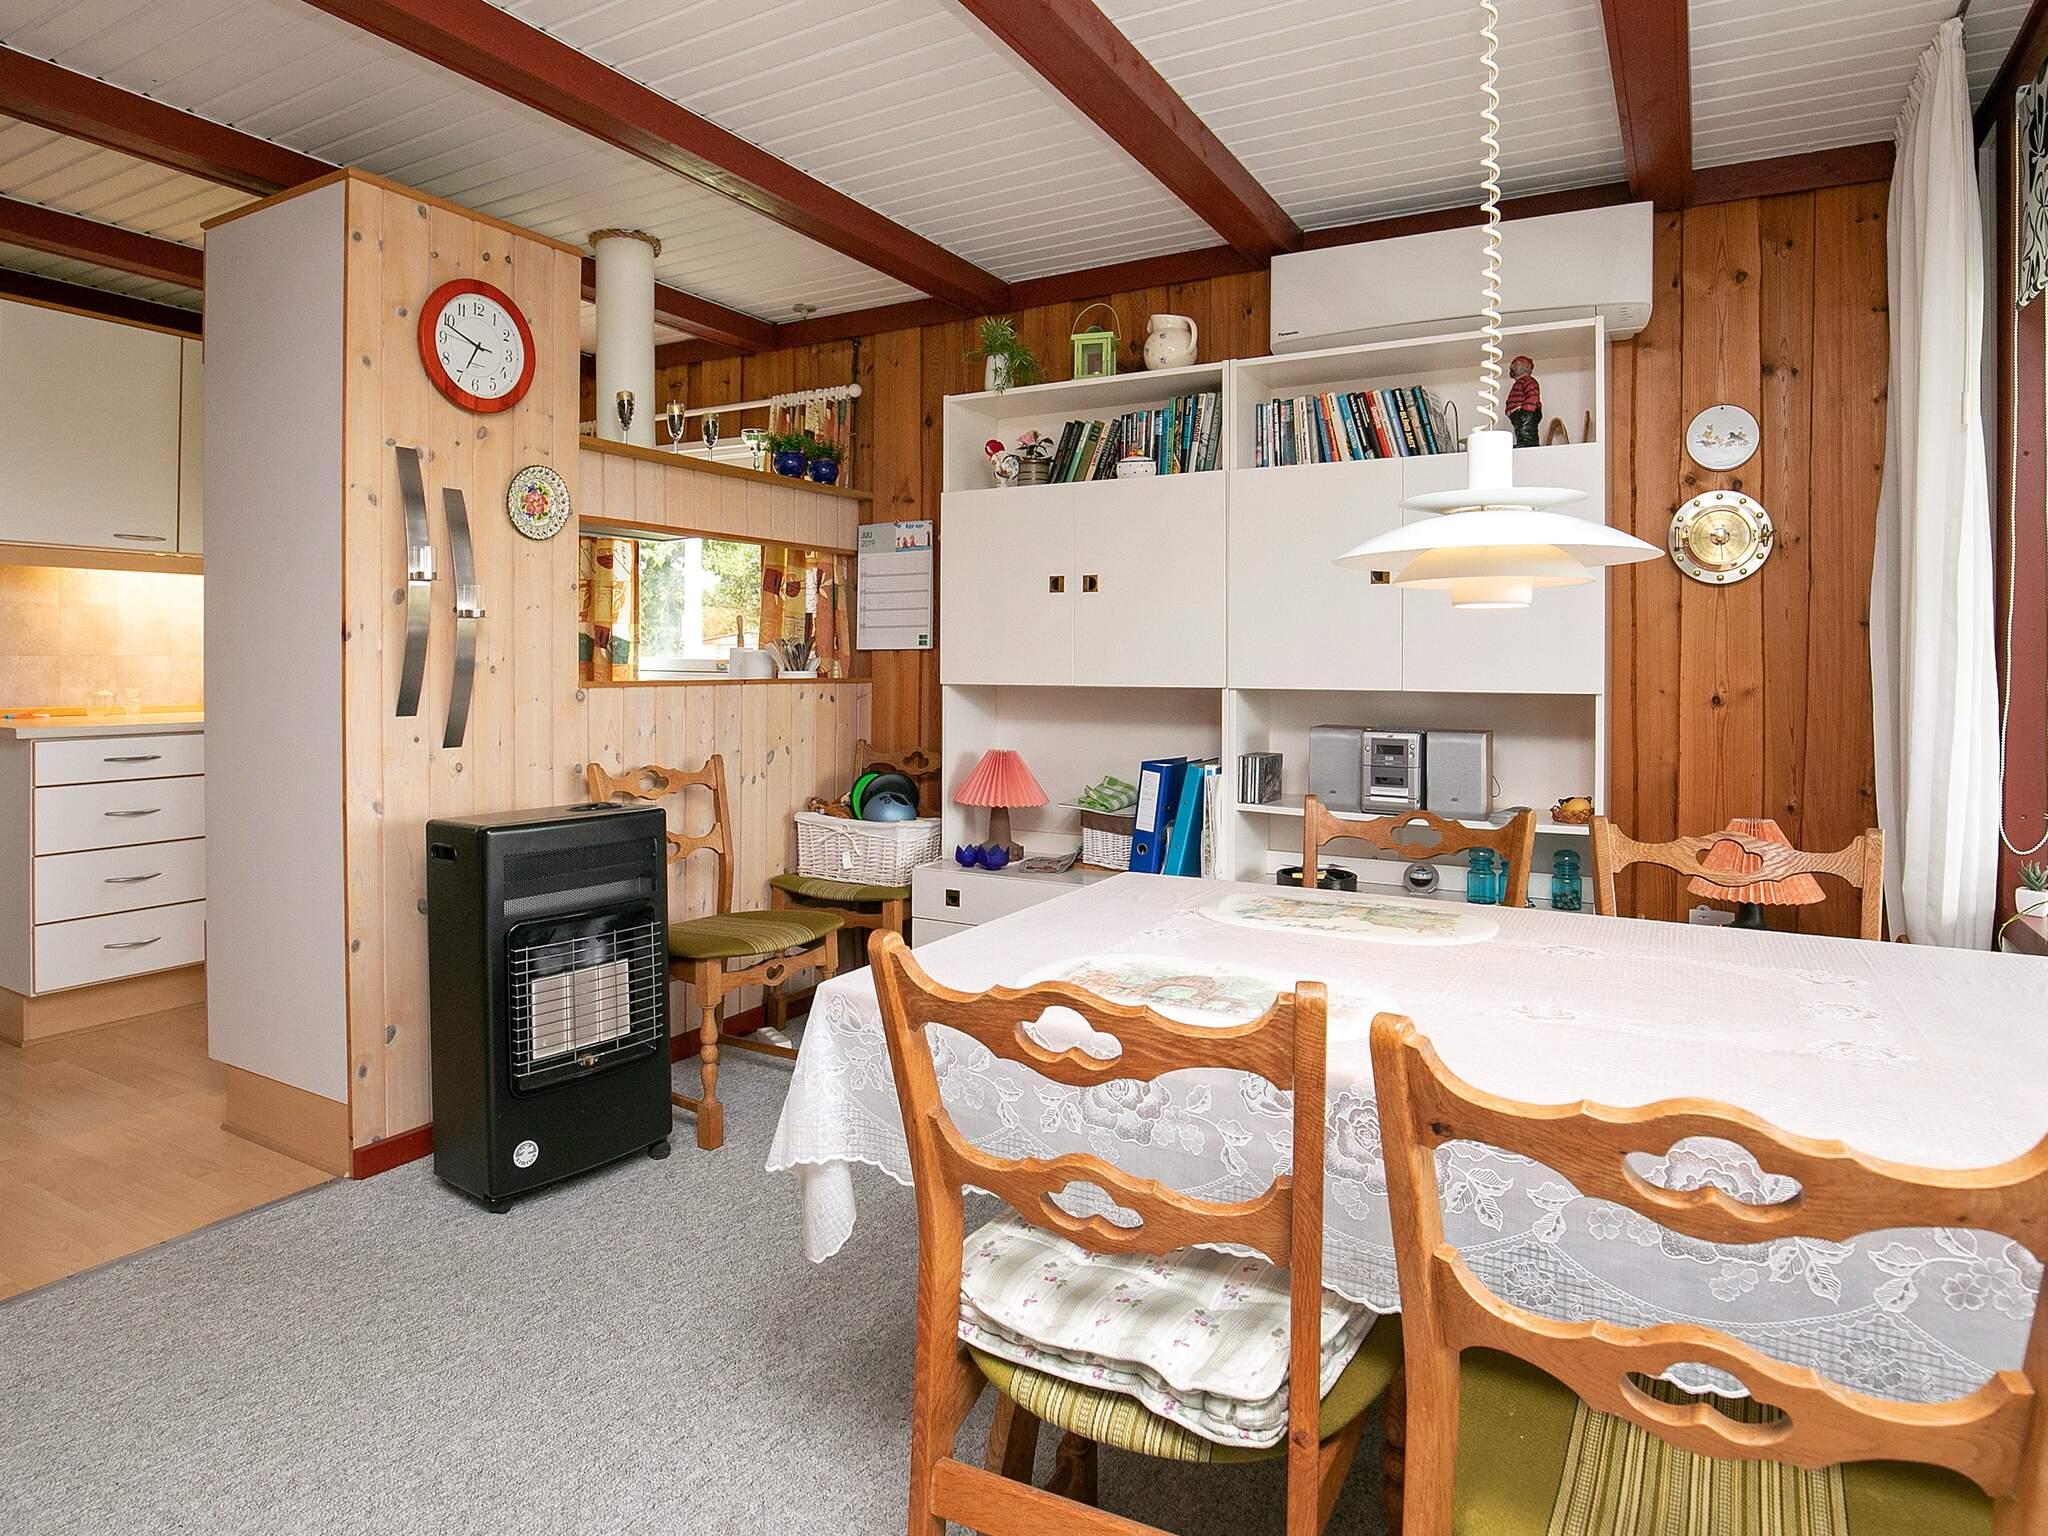 Maison de vacances Eskov Strandpark (610274), Roslev, , Limfjord, Danemark, image 9